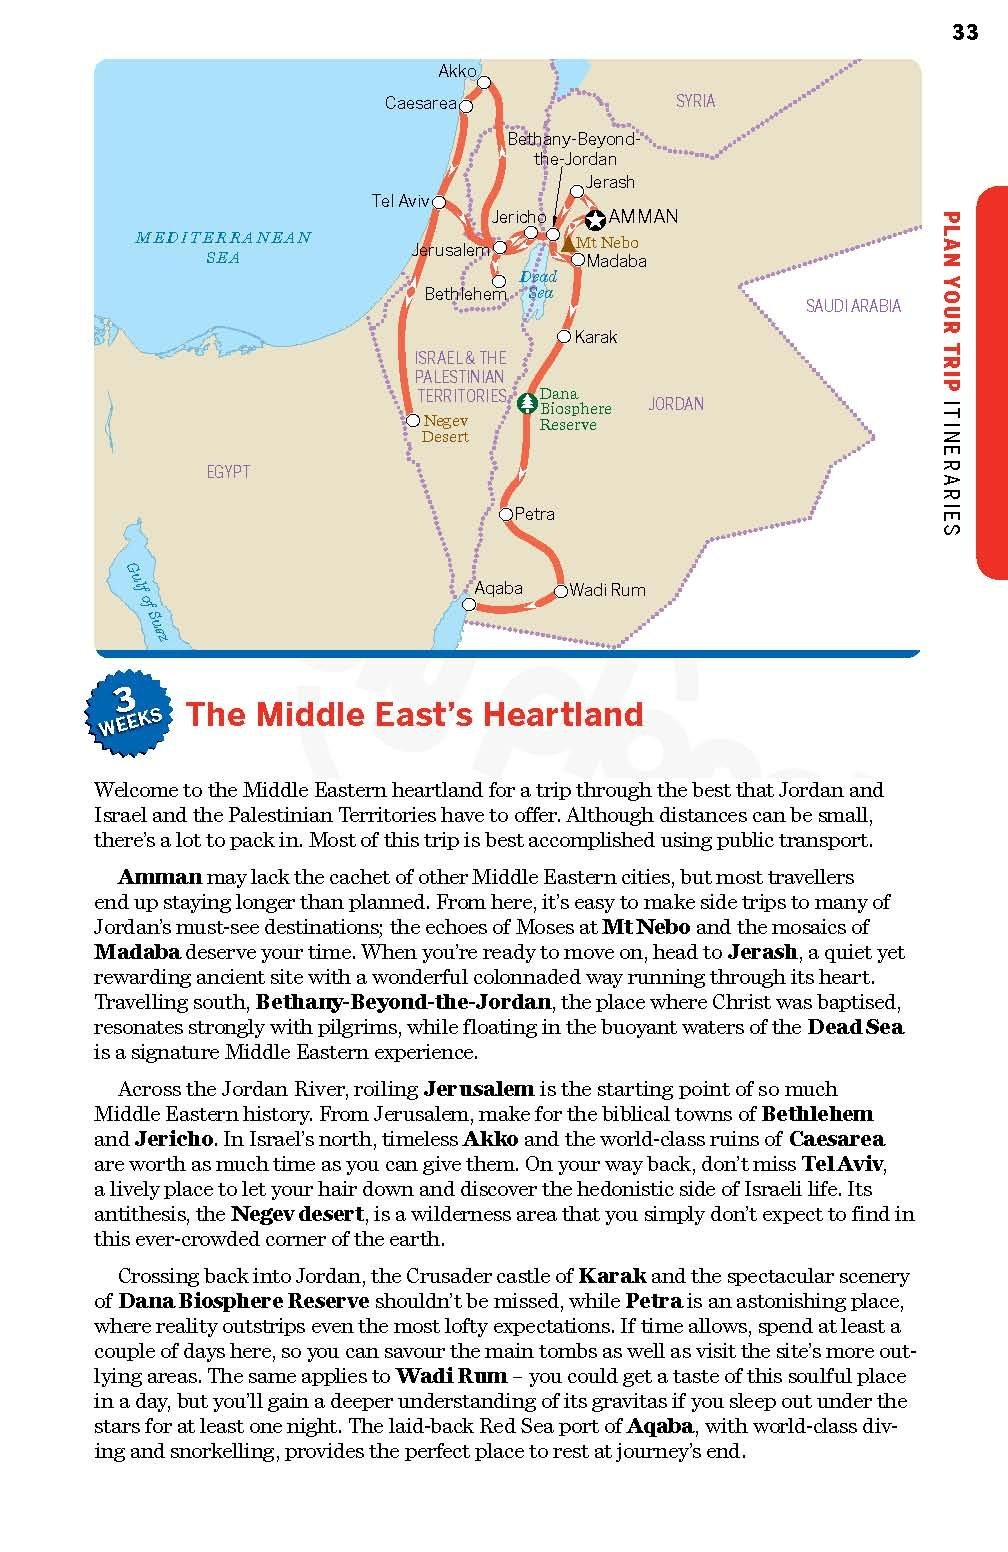 Middle East (Lonely Planet Travel Guide): Amazon.de: Planet ...